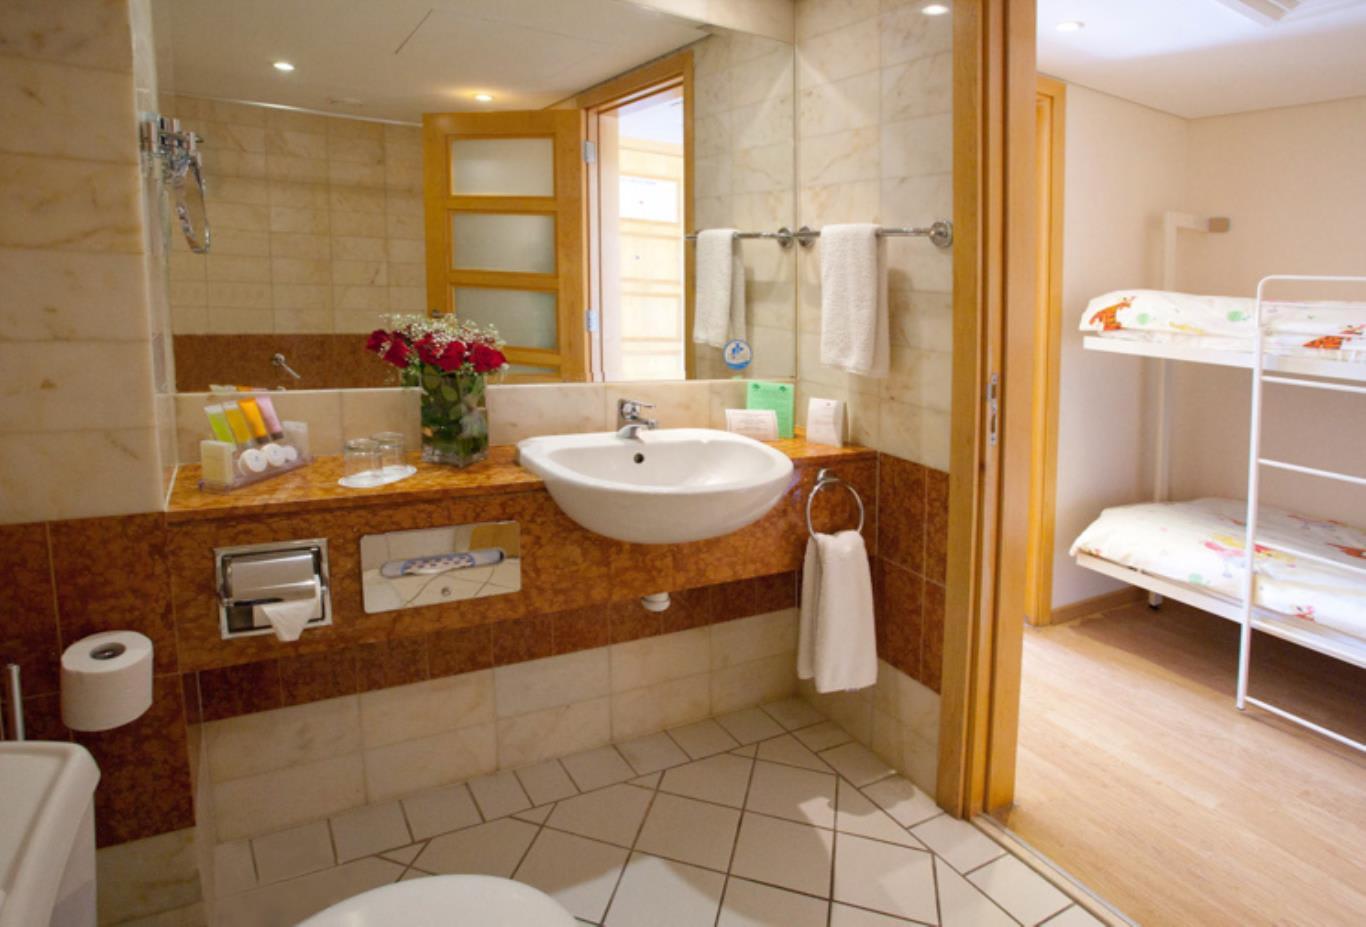 Executive Pool Bathroom